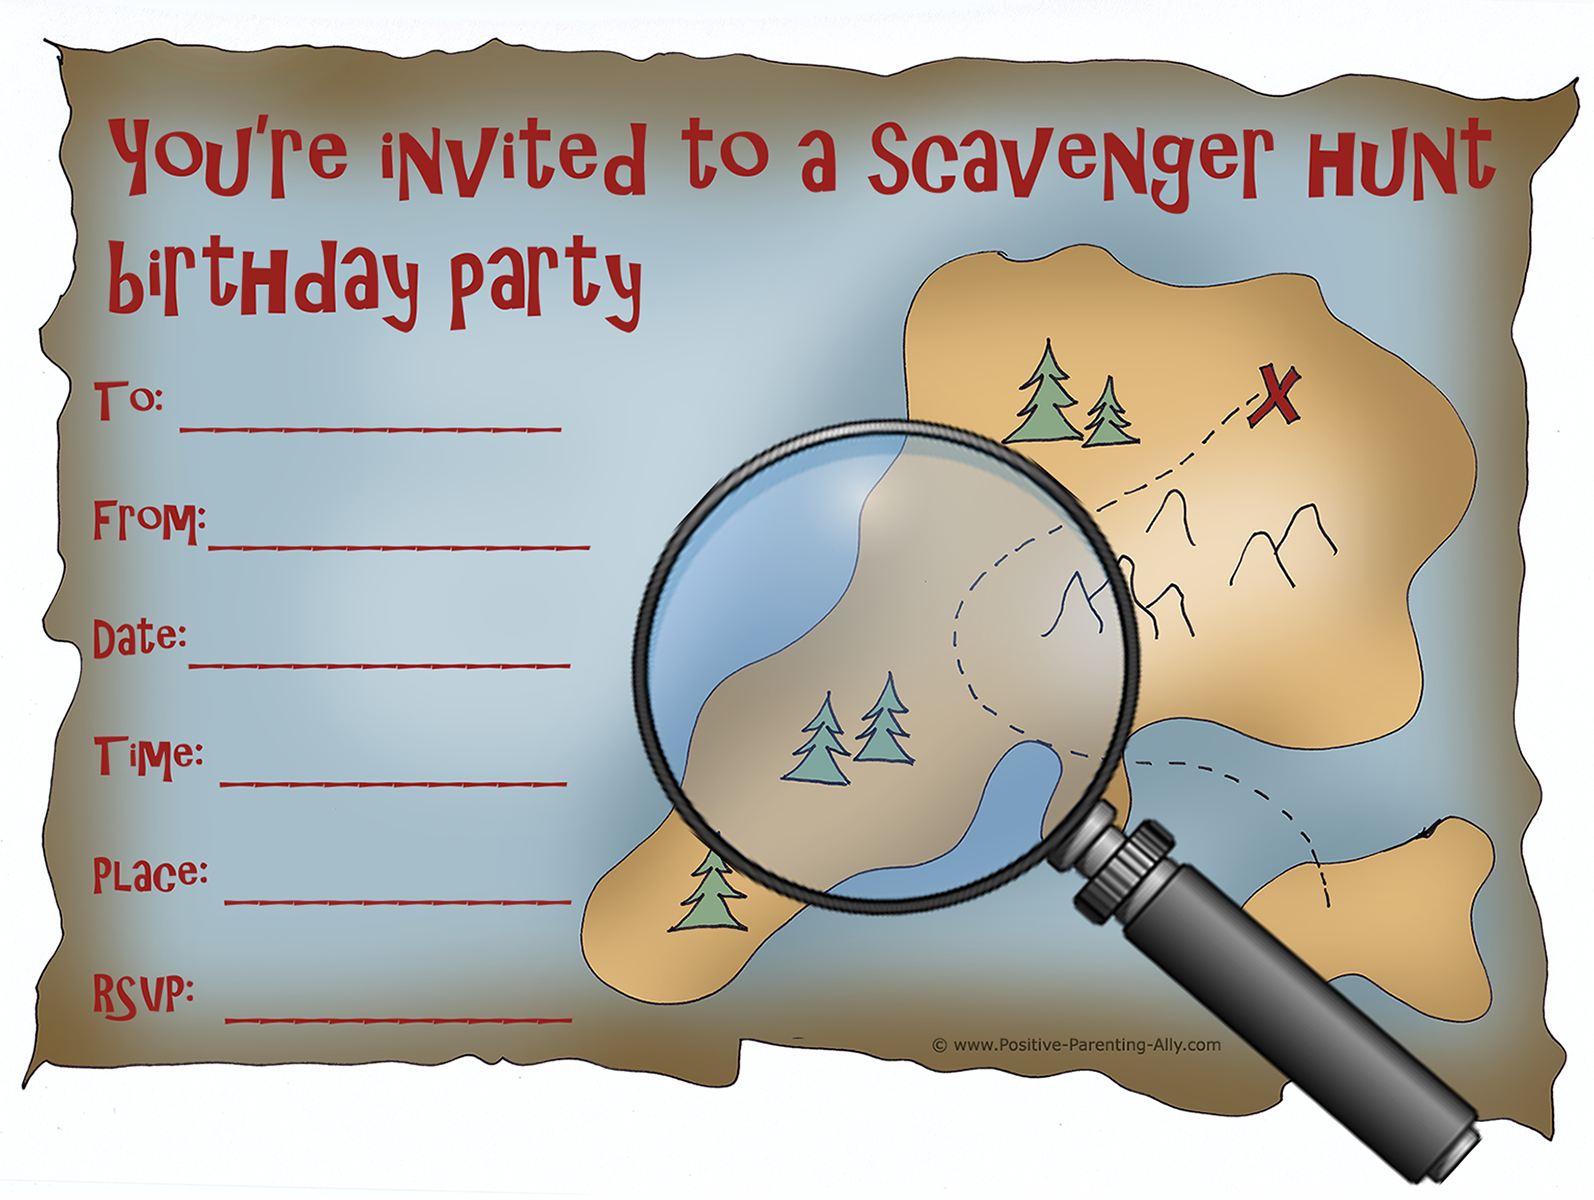 Scavenger hunt pritable birthday invitation with treasure map to print.